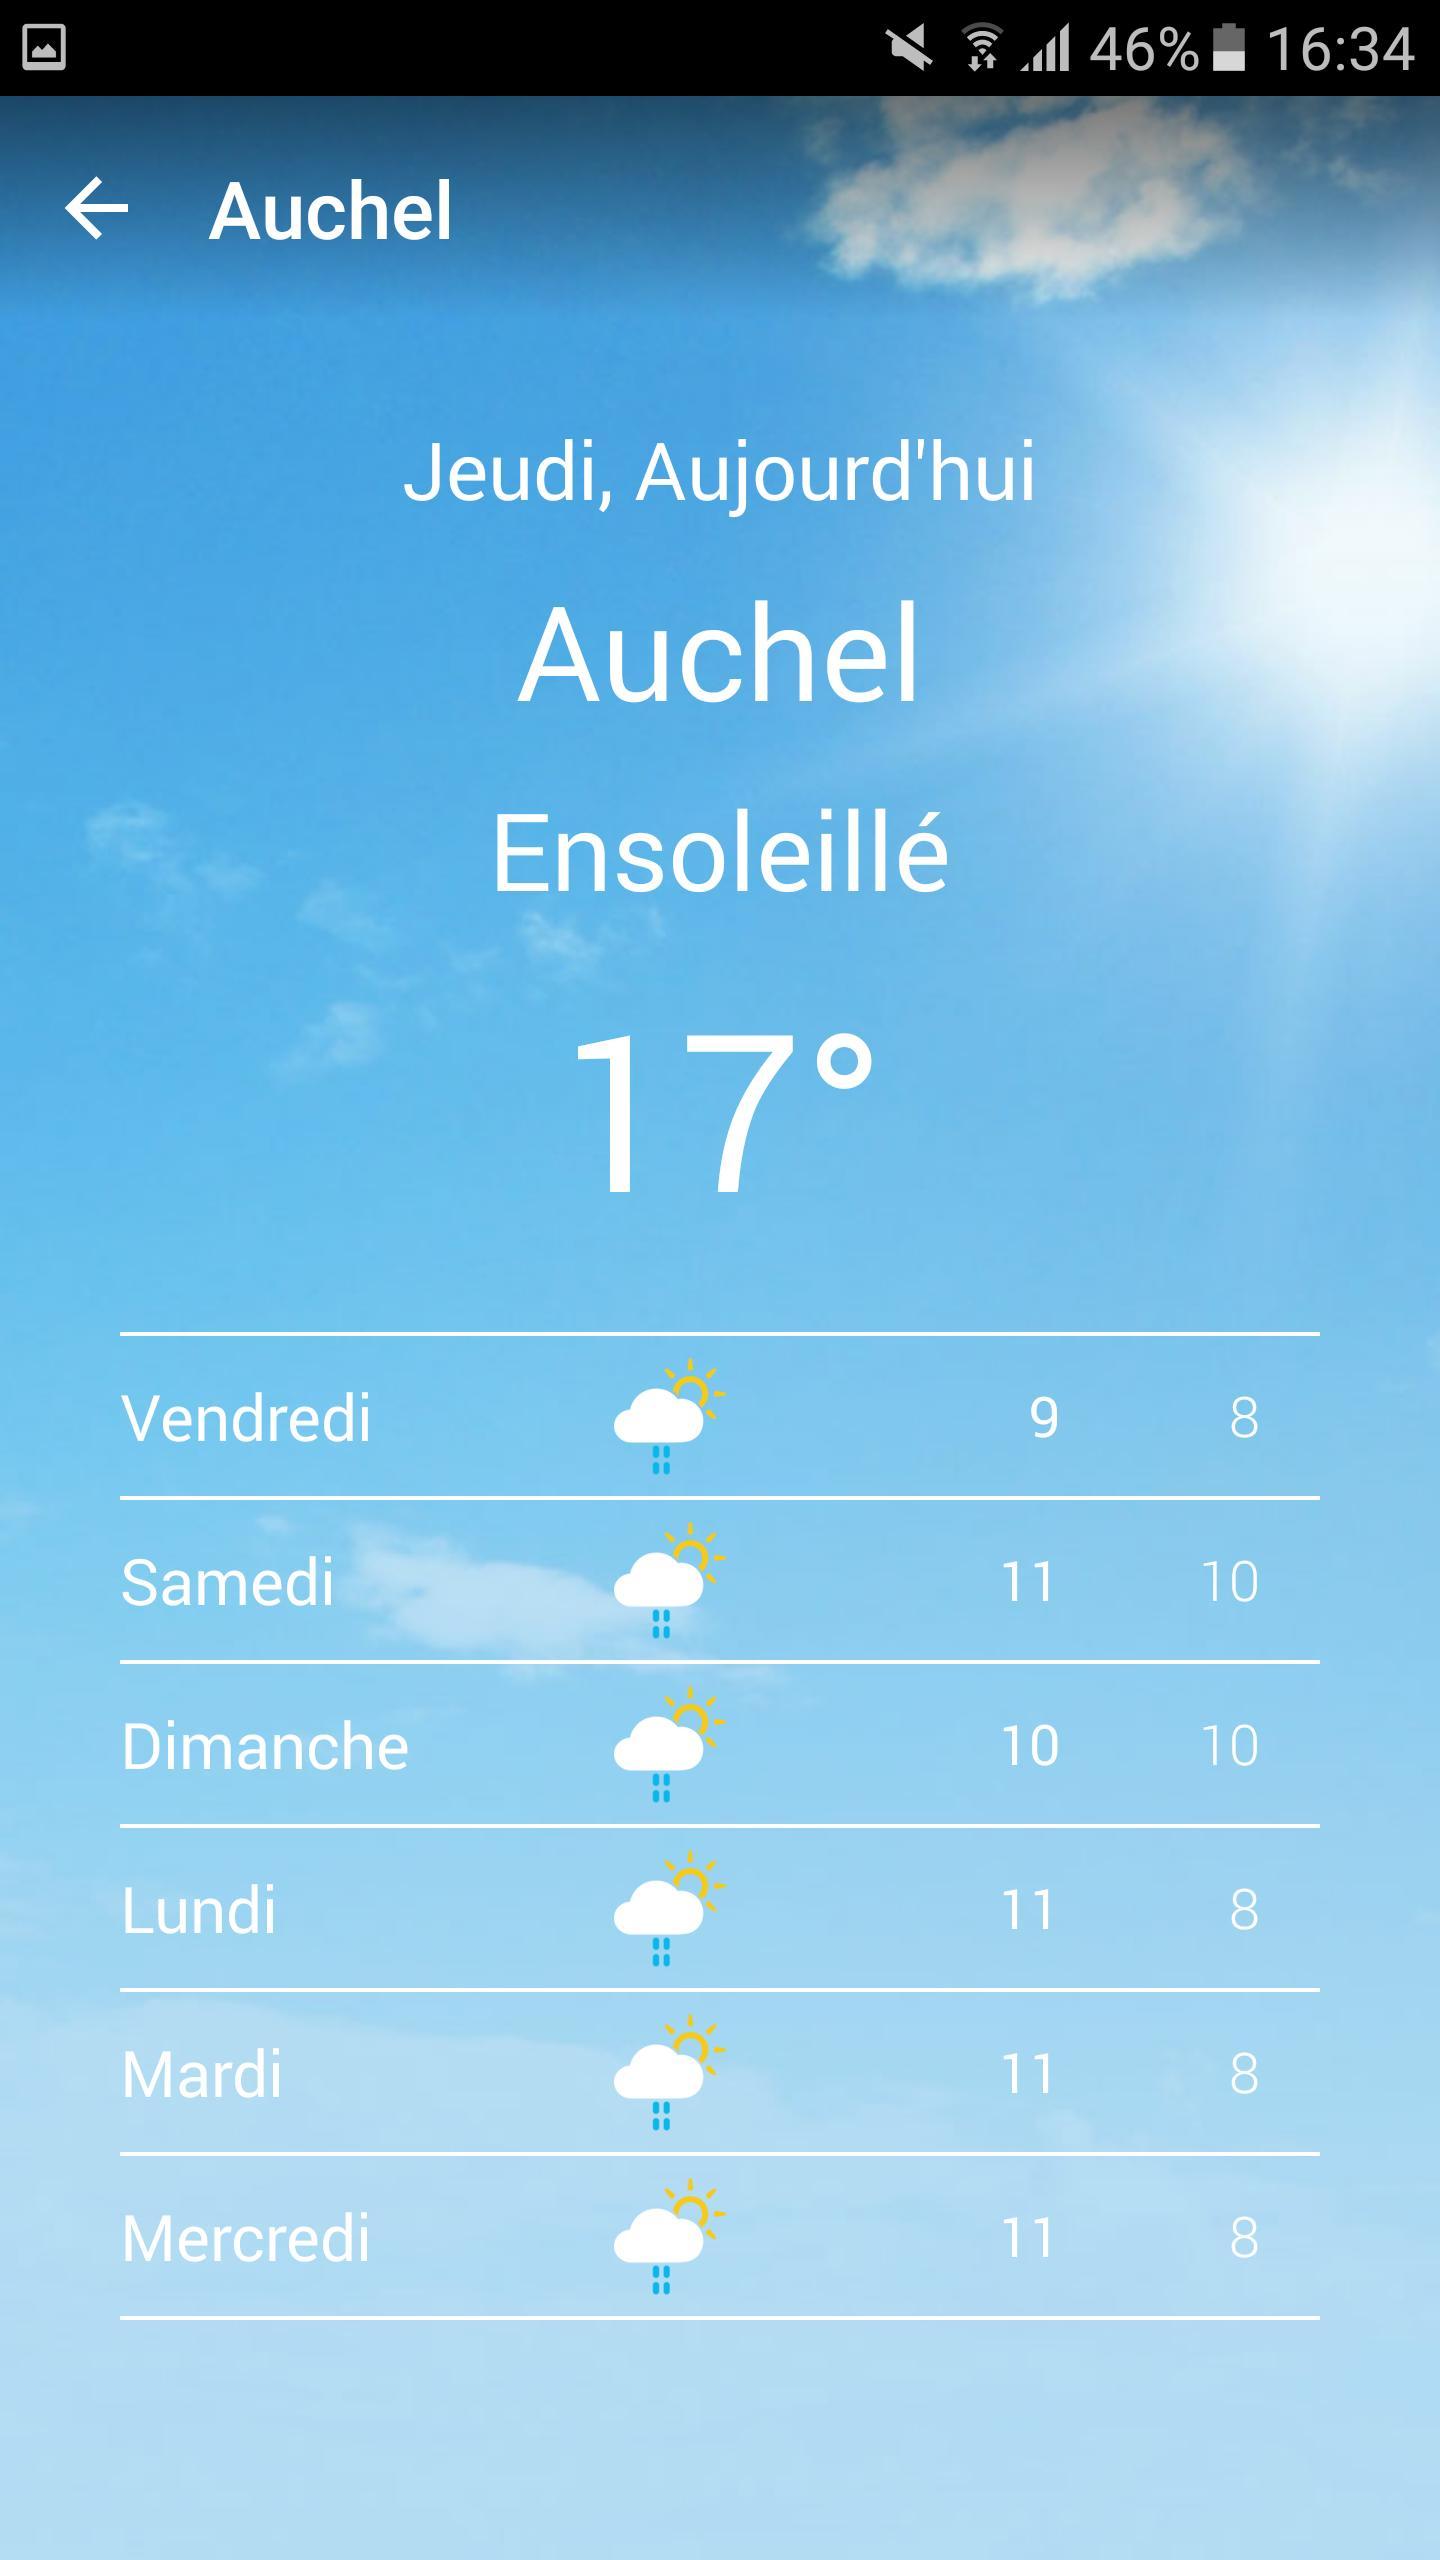 Android Için Auchel - Apk'yı İndir à Piscine Auchel